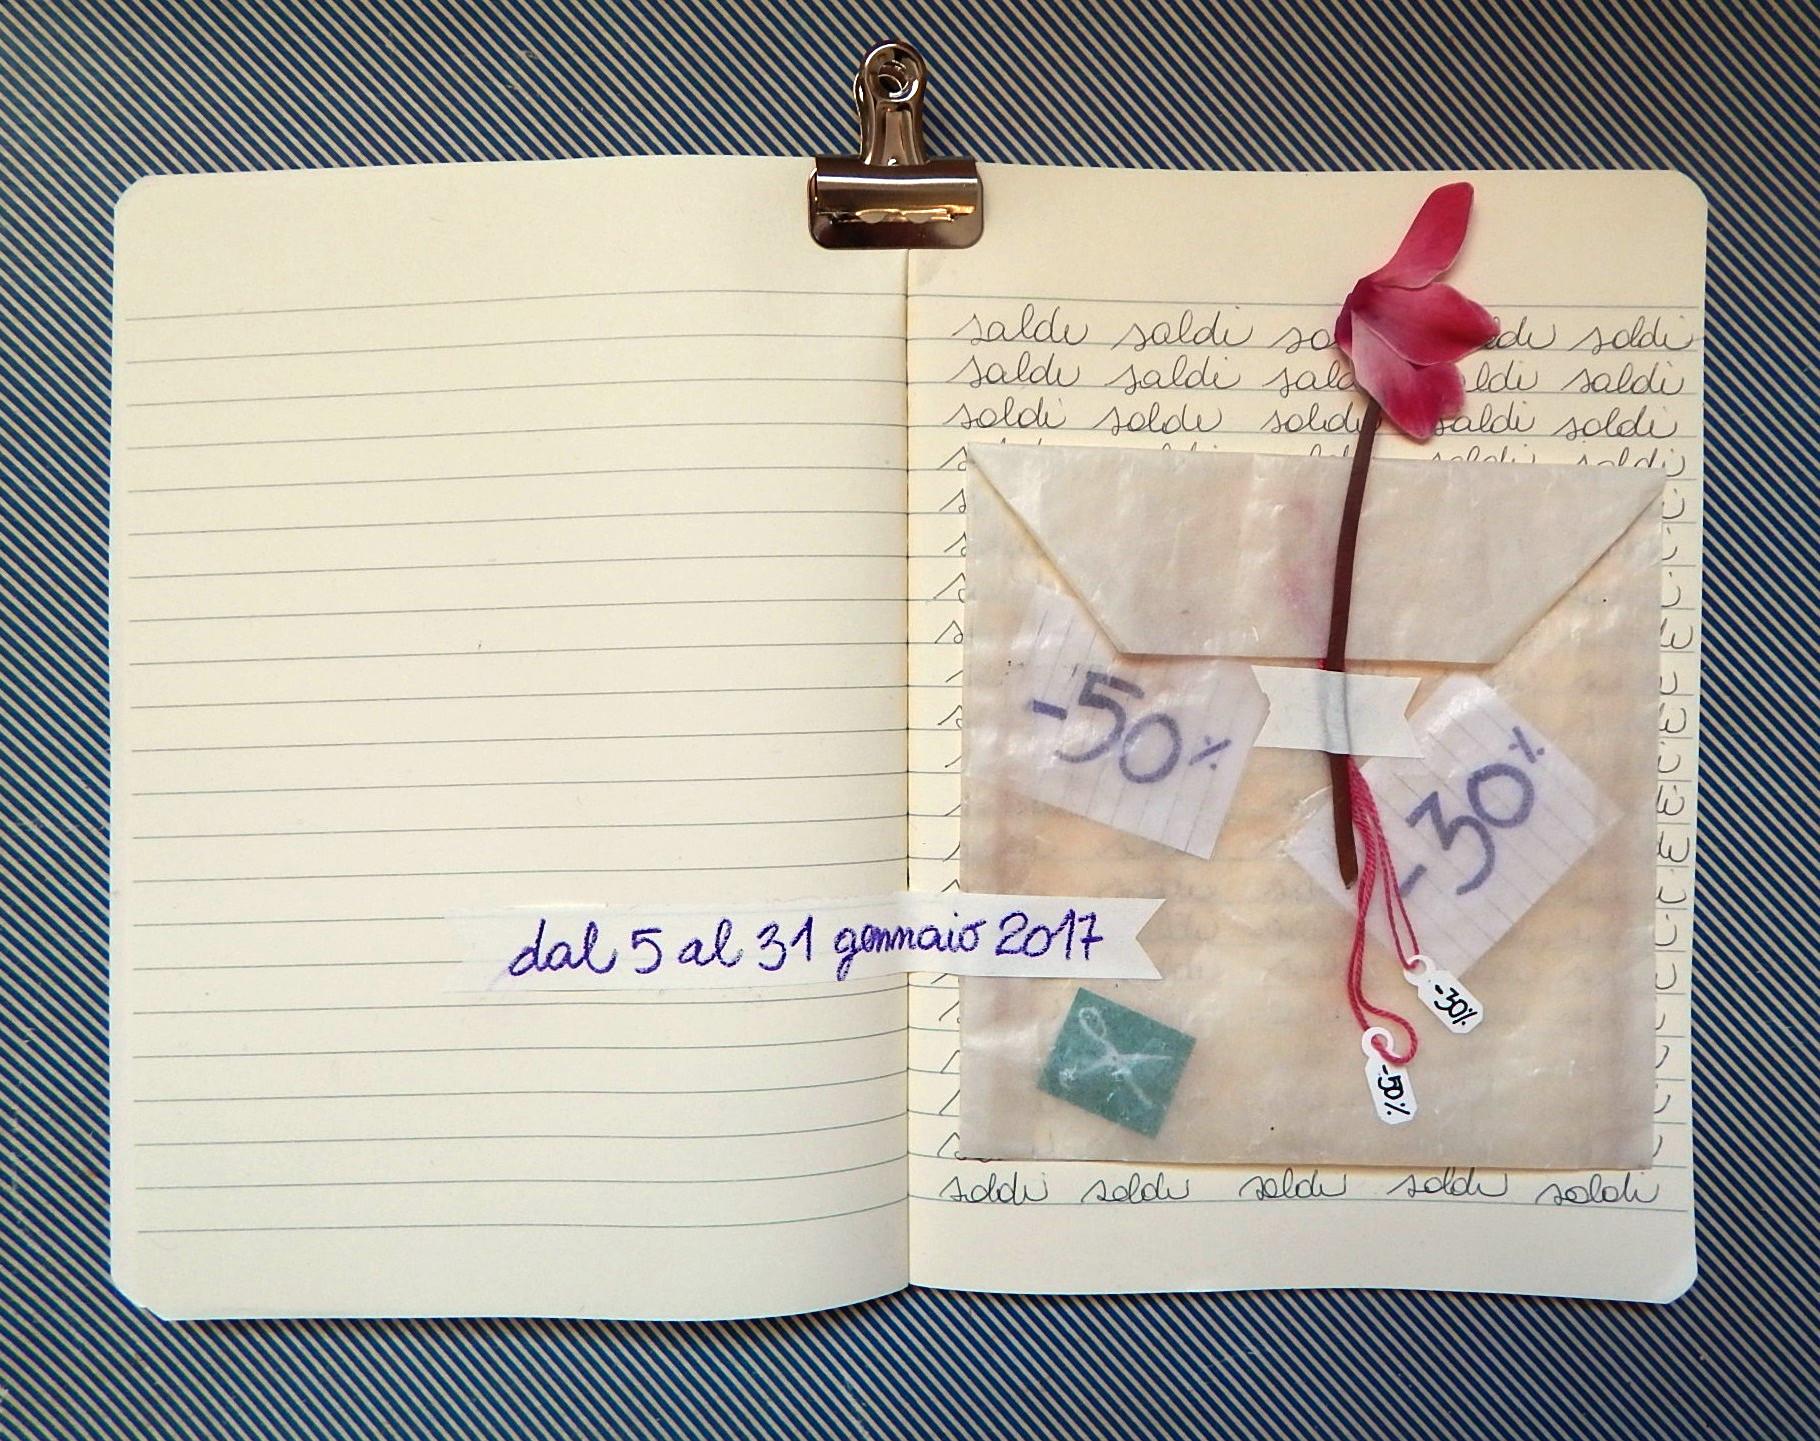 sketchbook - saldi